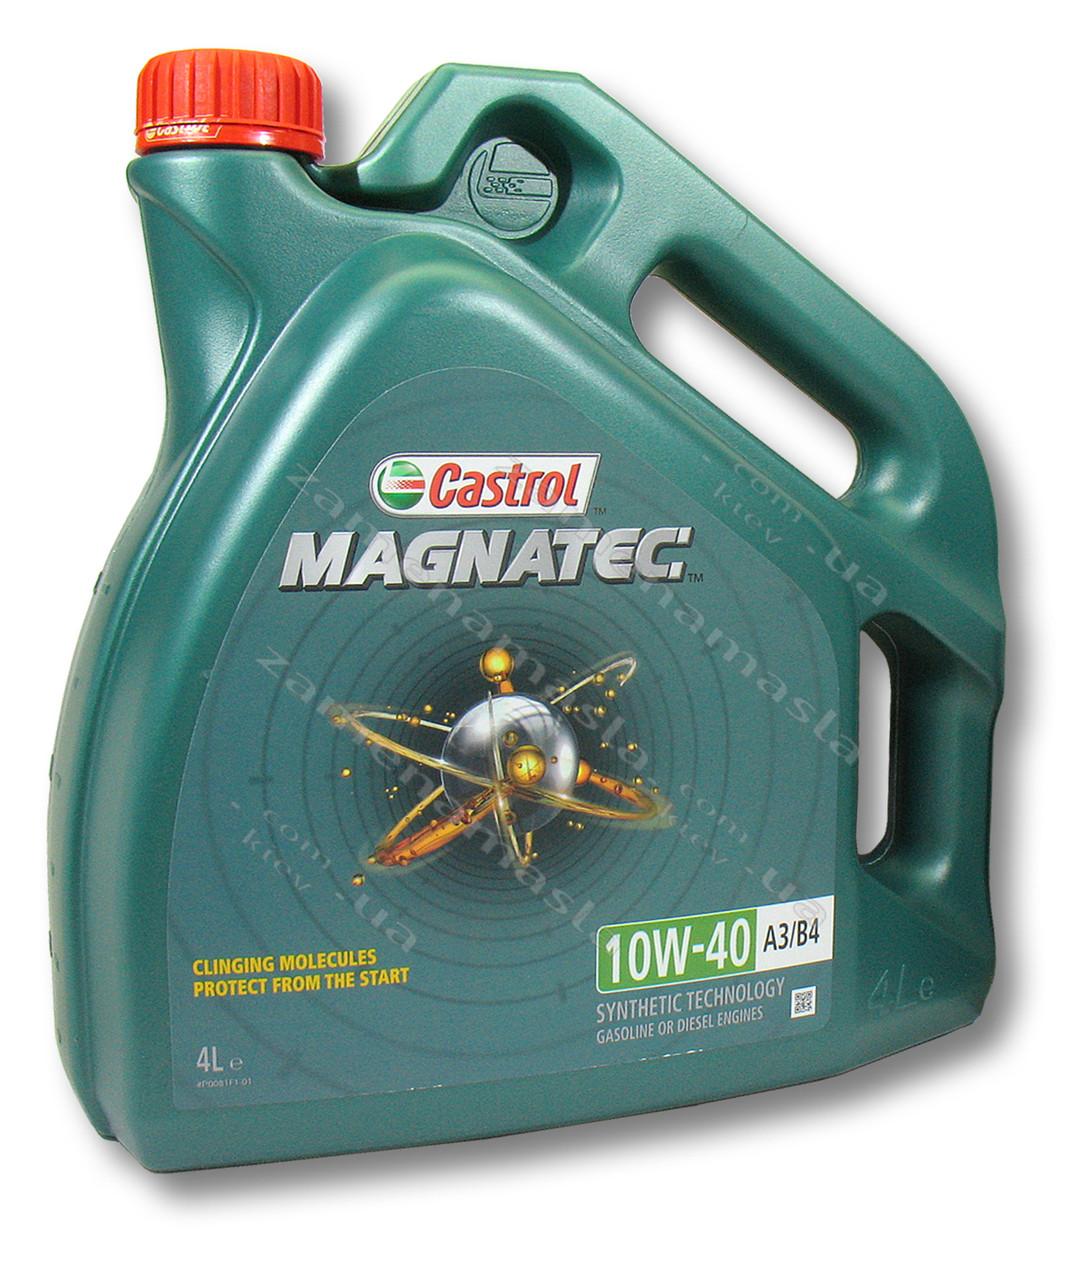 Castrol Magnatec 10W-40 A3/B4 4л- моторное масло